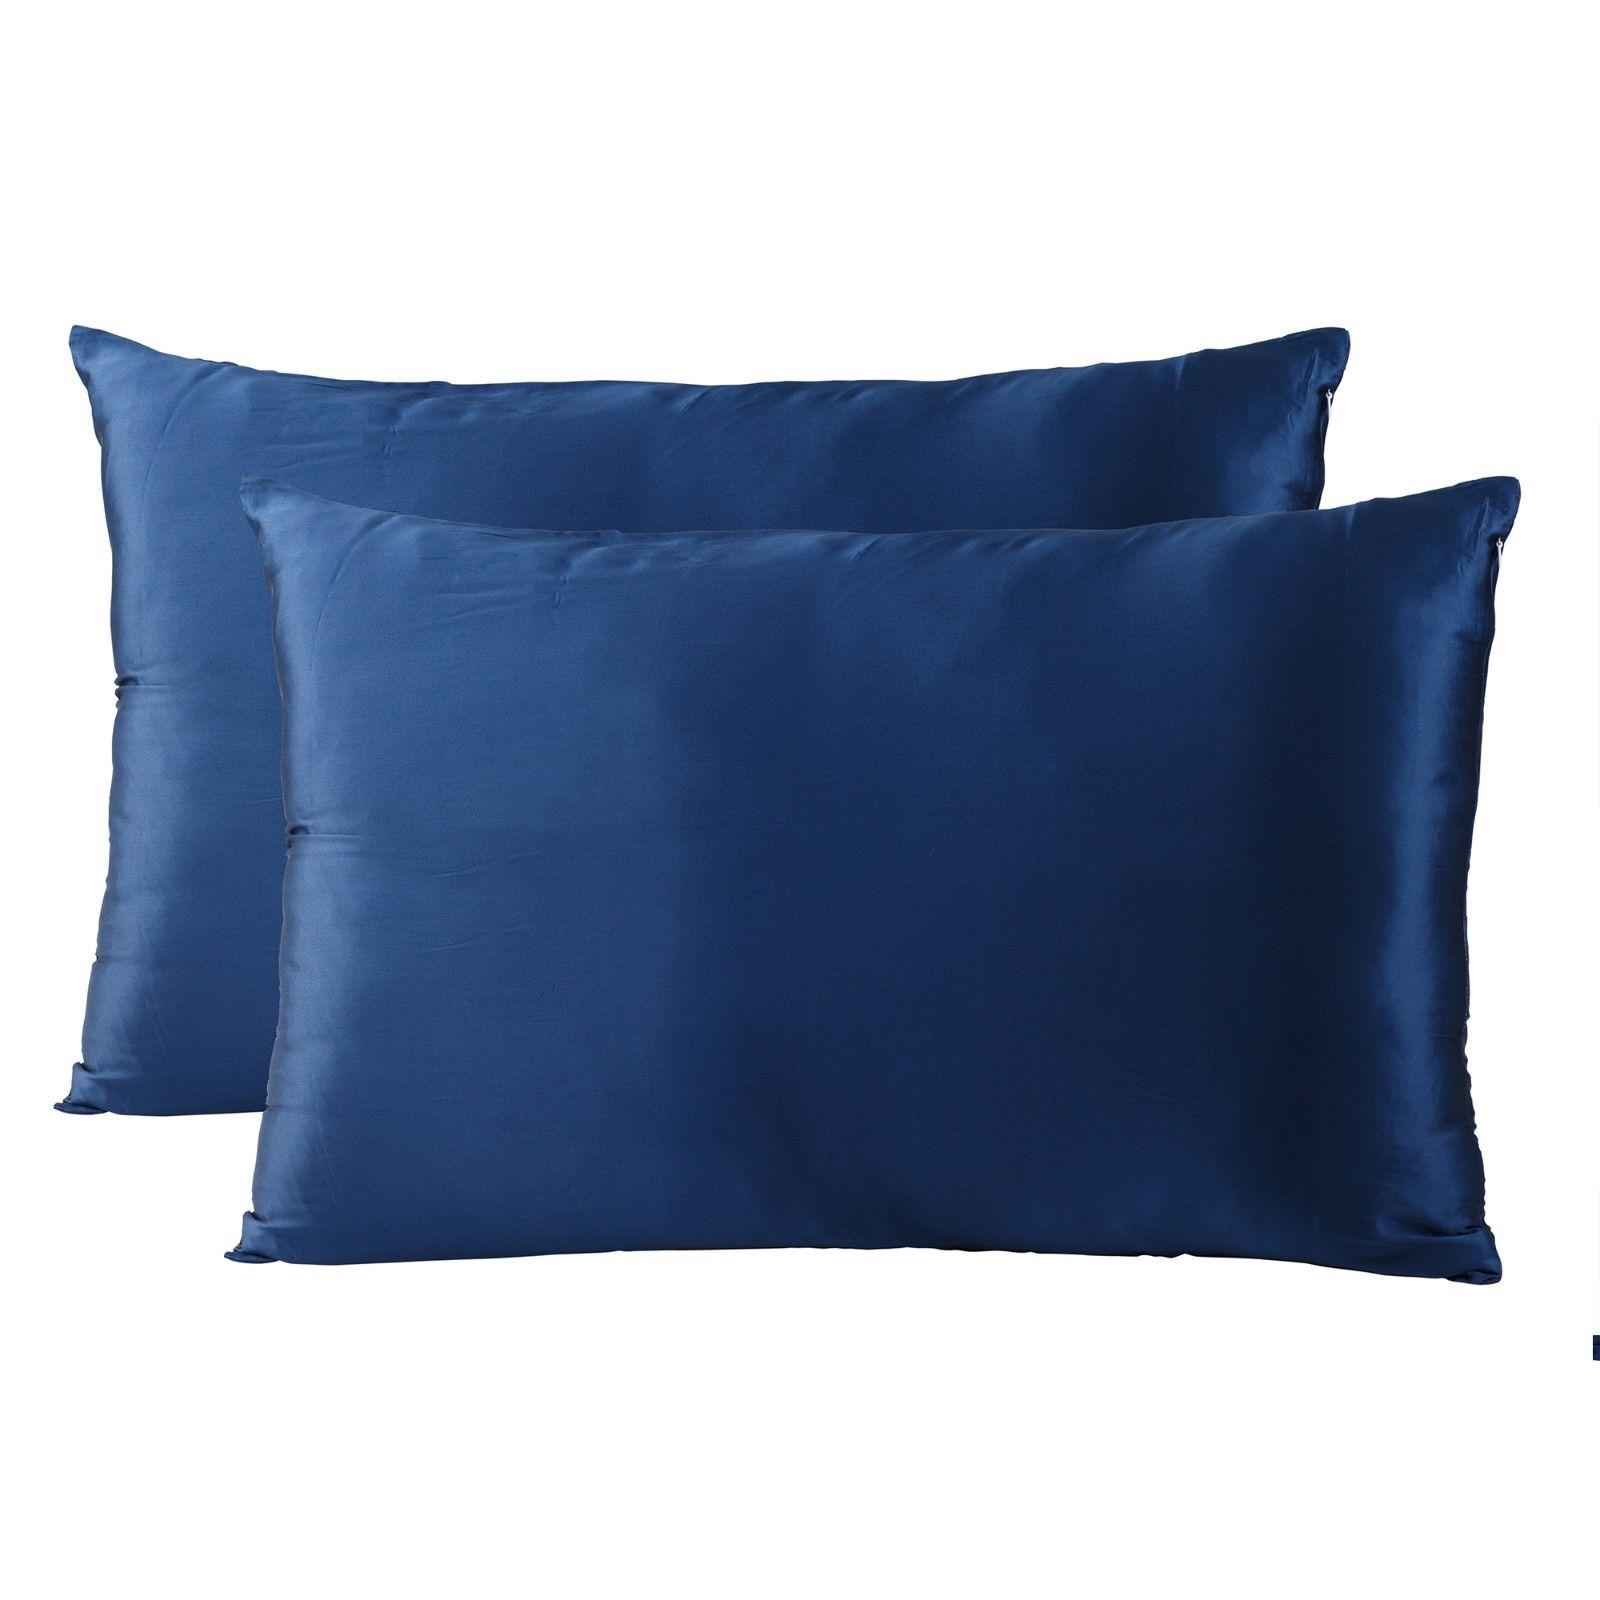 Royal Comfort Mulberry Soft Silk Hypoallergenic Pillowcase